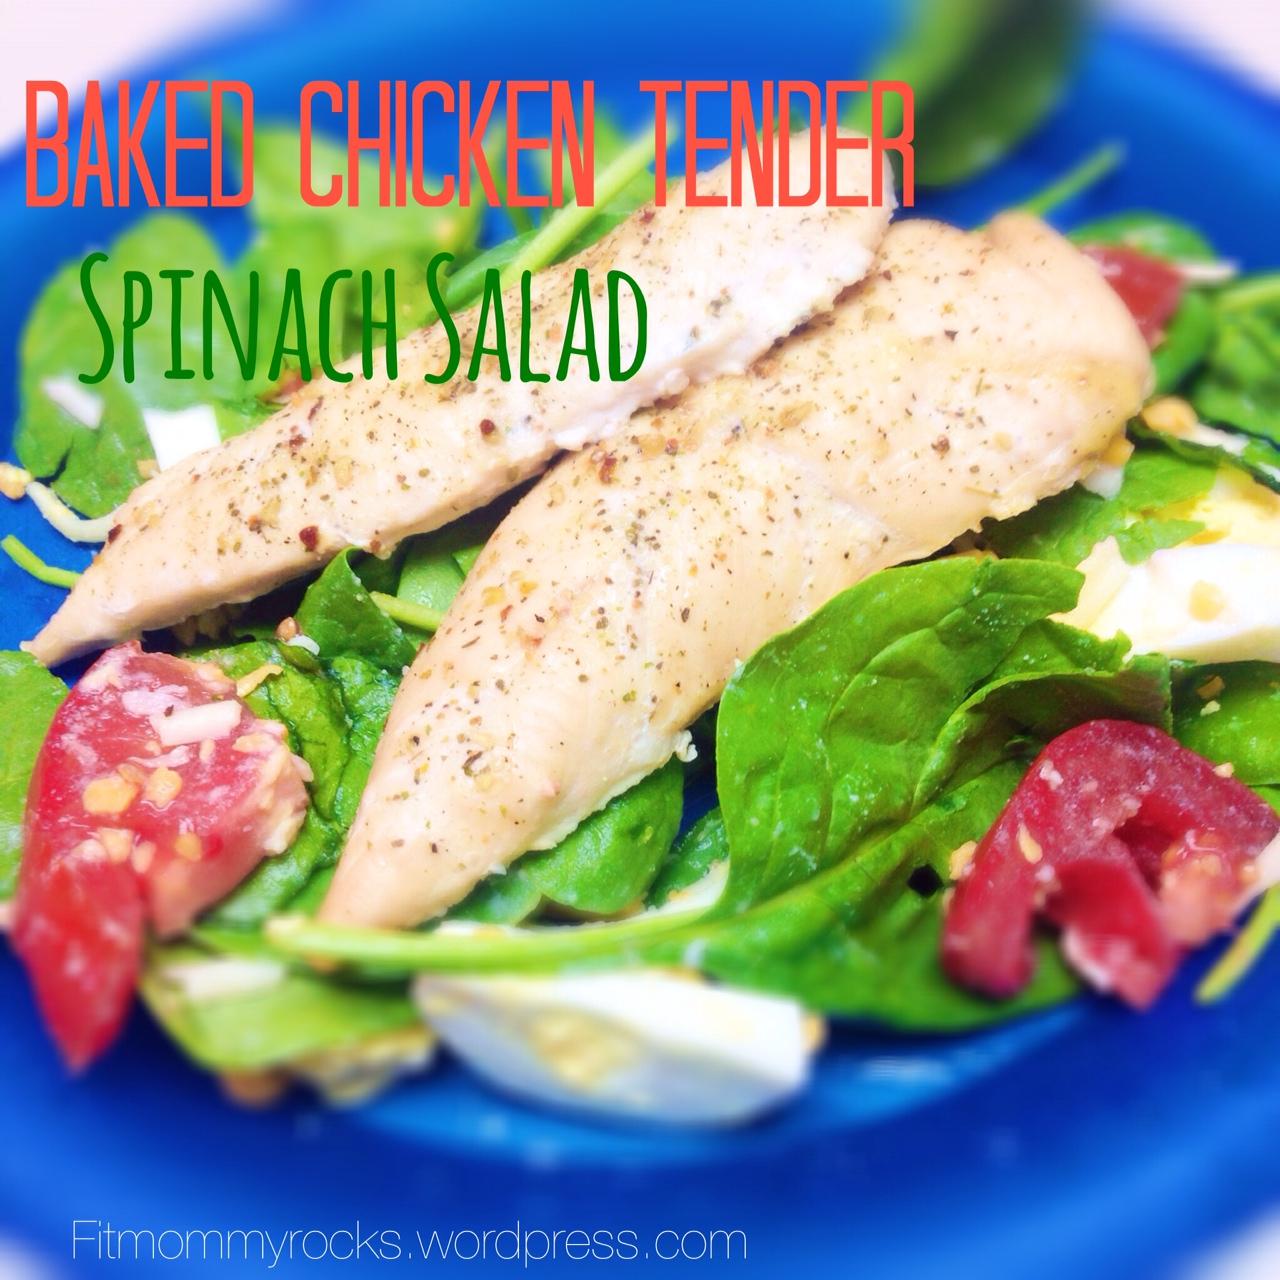 1280 x 1280 jpeg 476kB, Baked Chicken Tender Spinach Salad